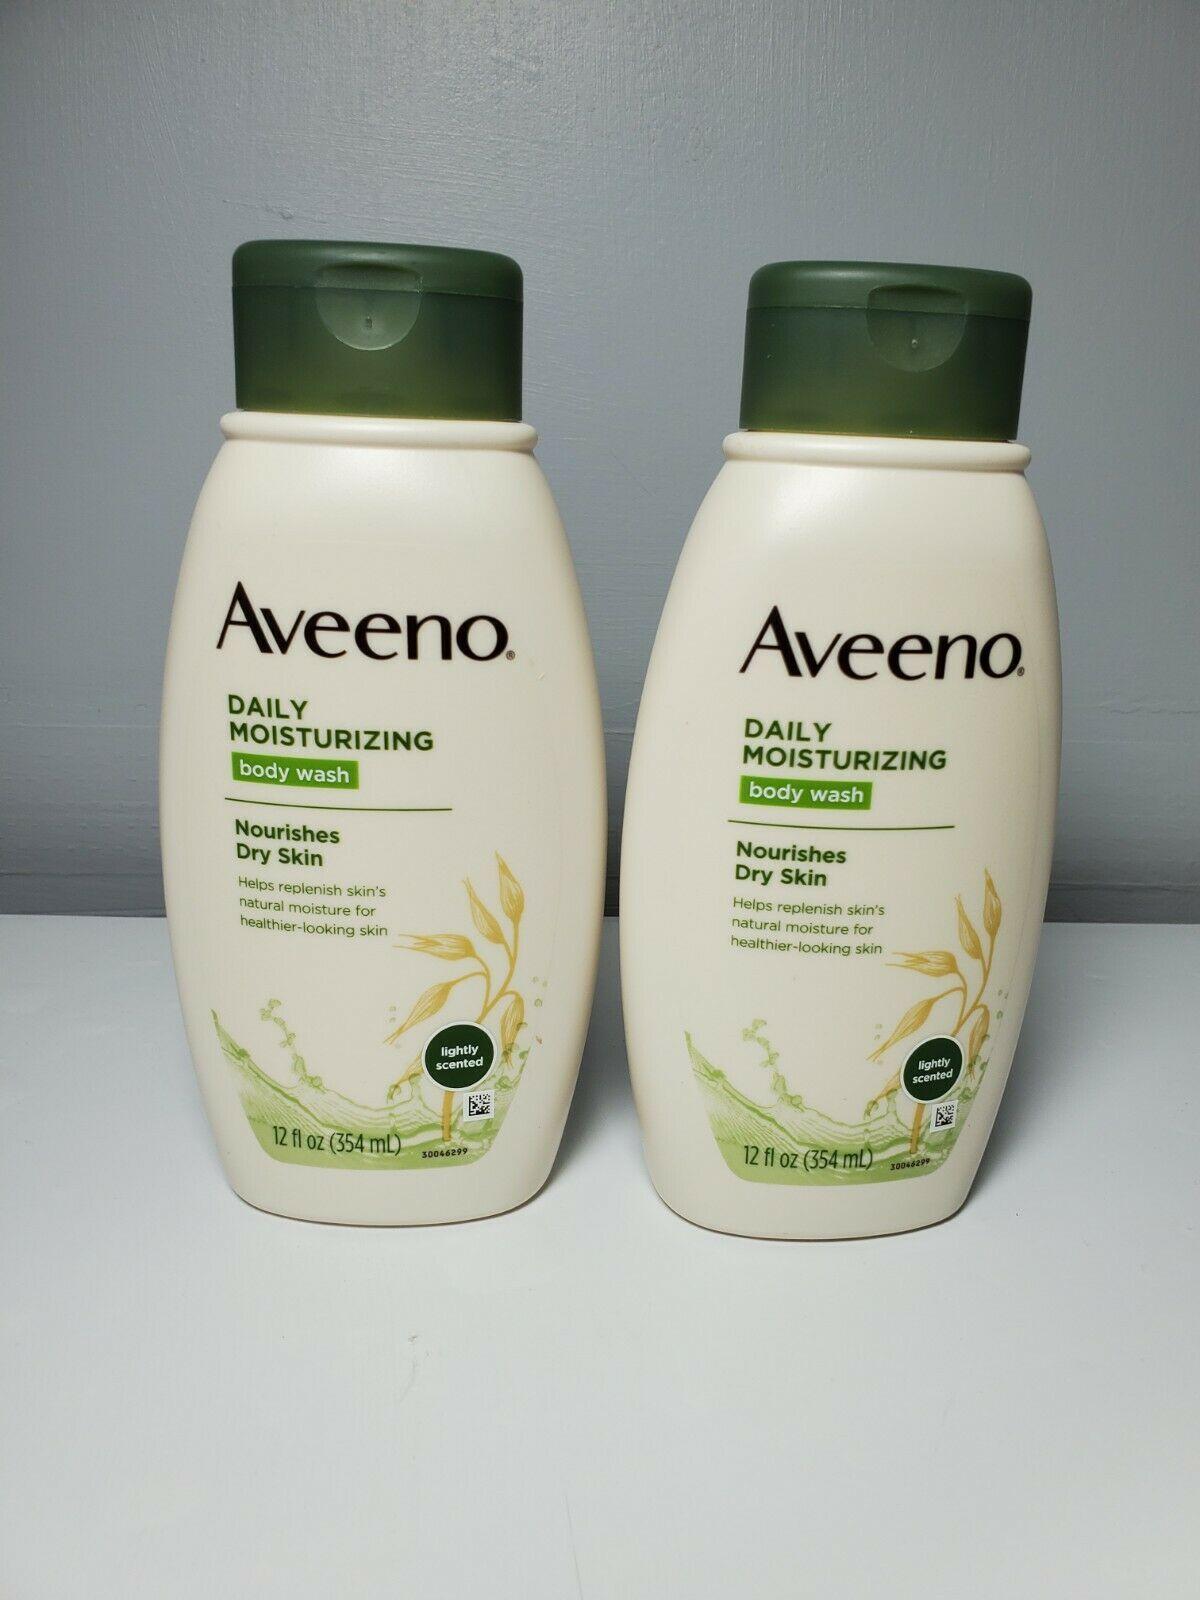 Set of 2 - Aveeno Daily Moisturizing Body Wash - 12 oz each - NEW - $24.75